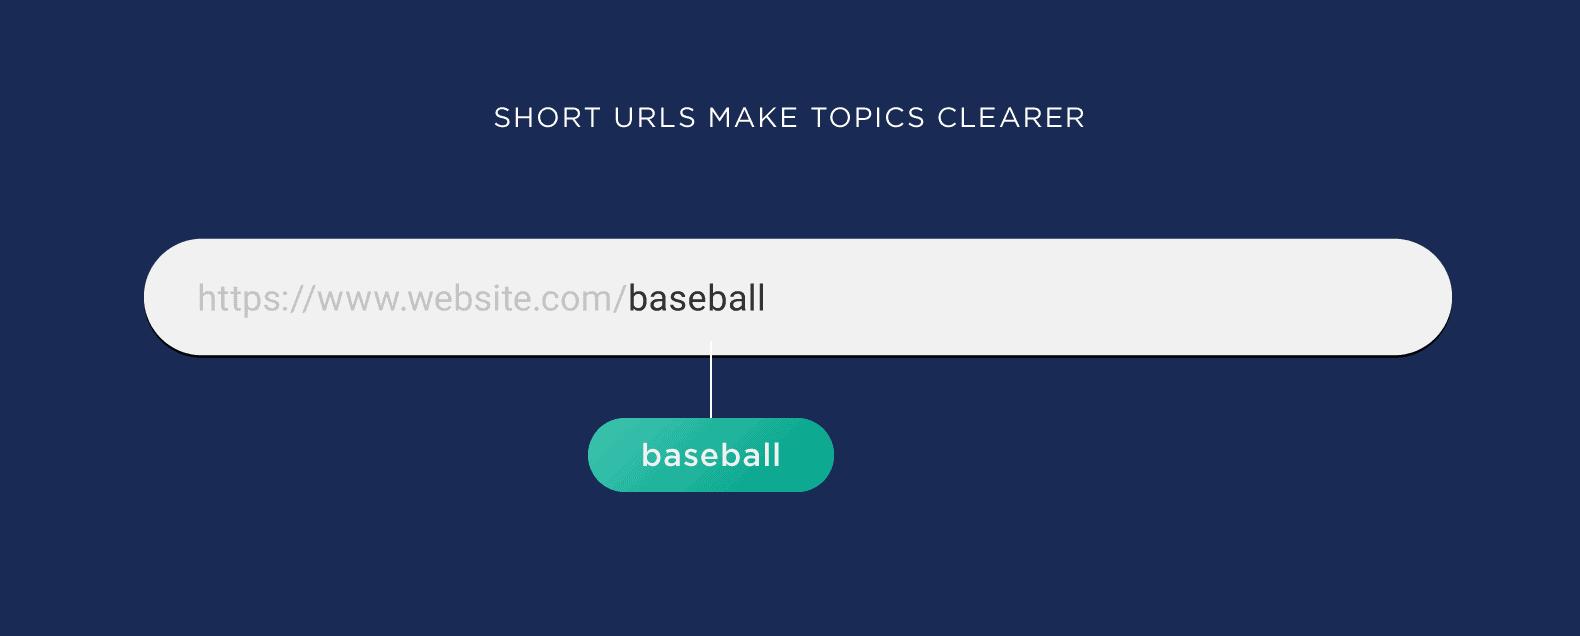 Short URLs make topics clearer